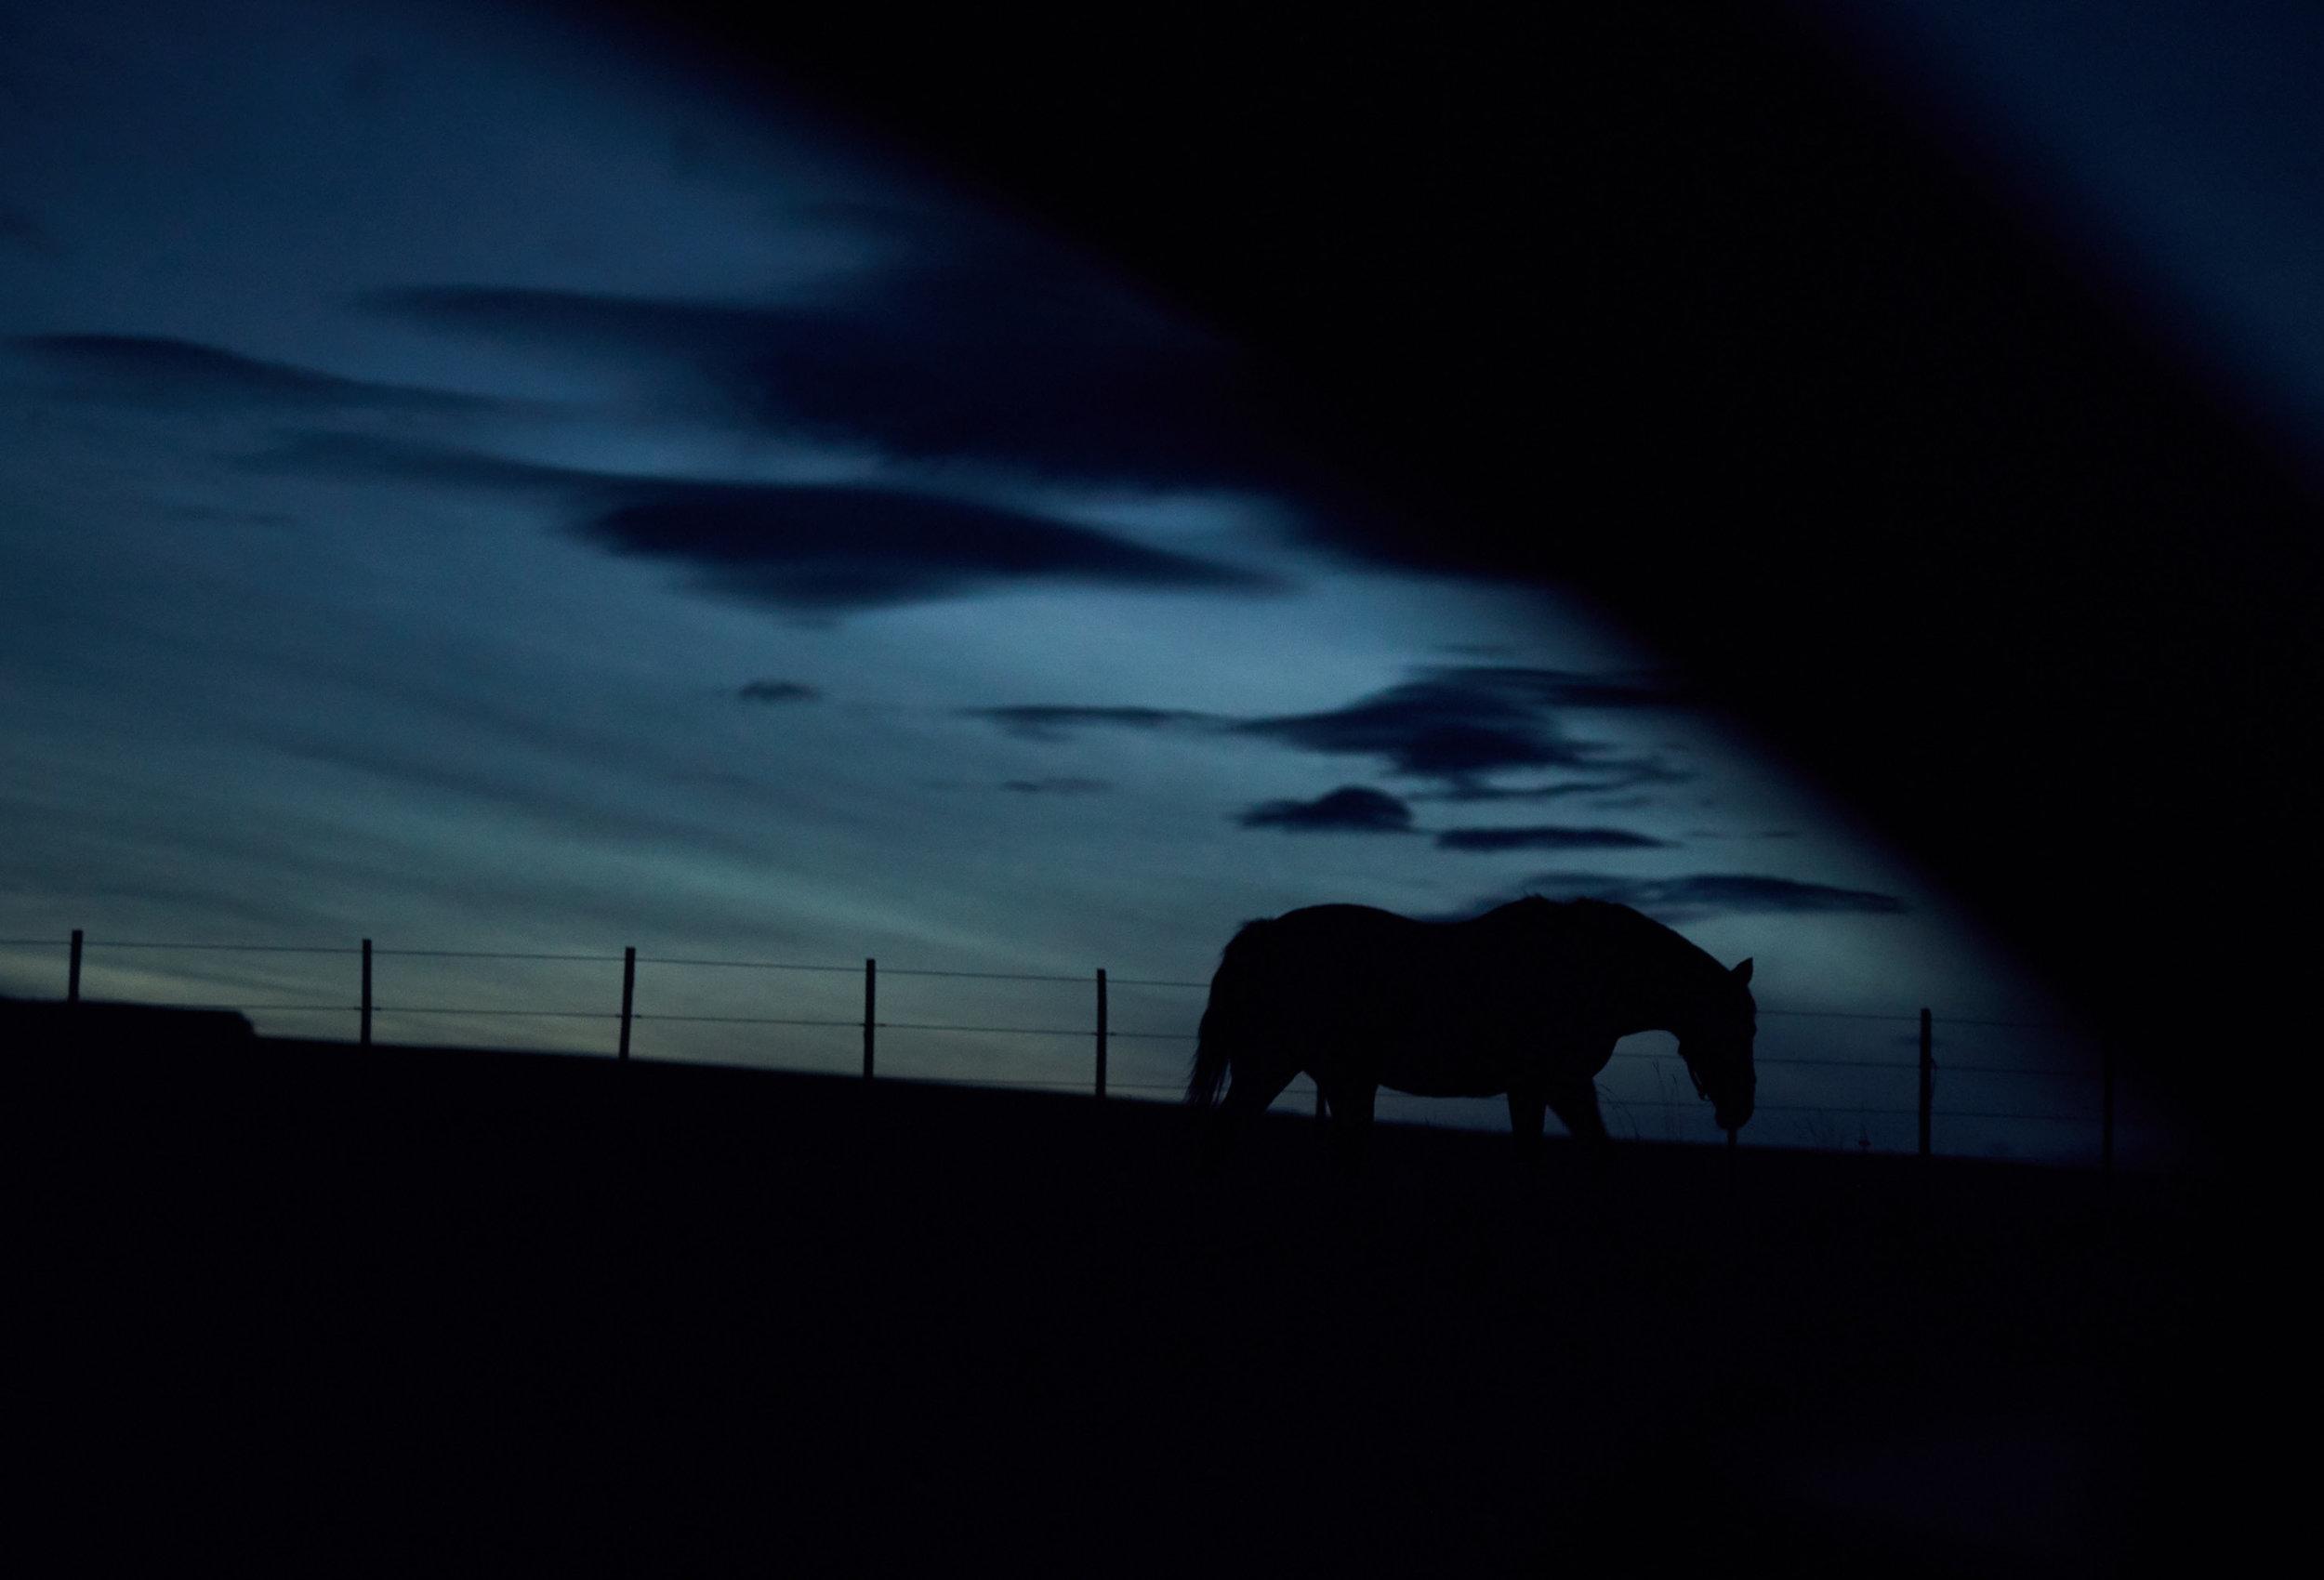 patagoniahorse.jpg